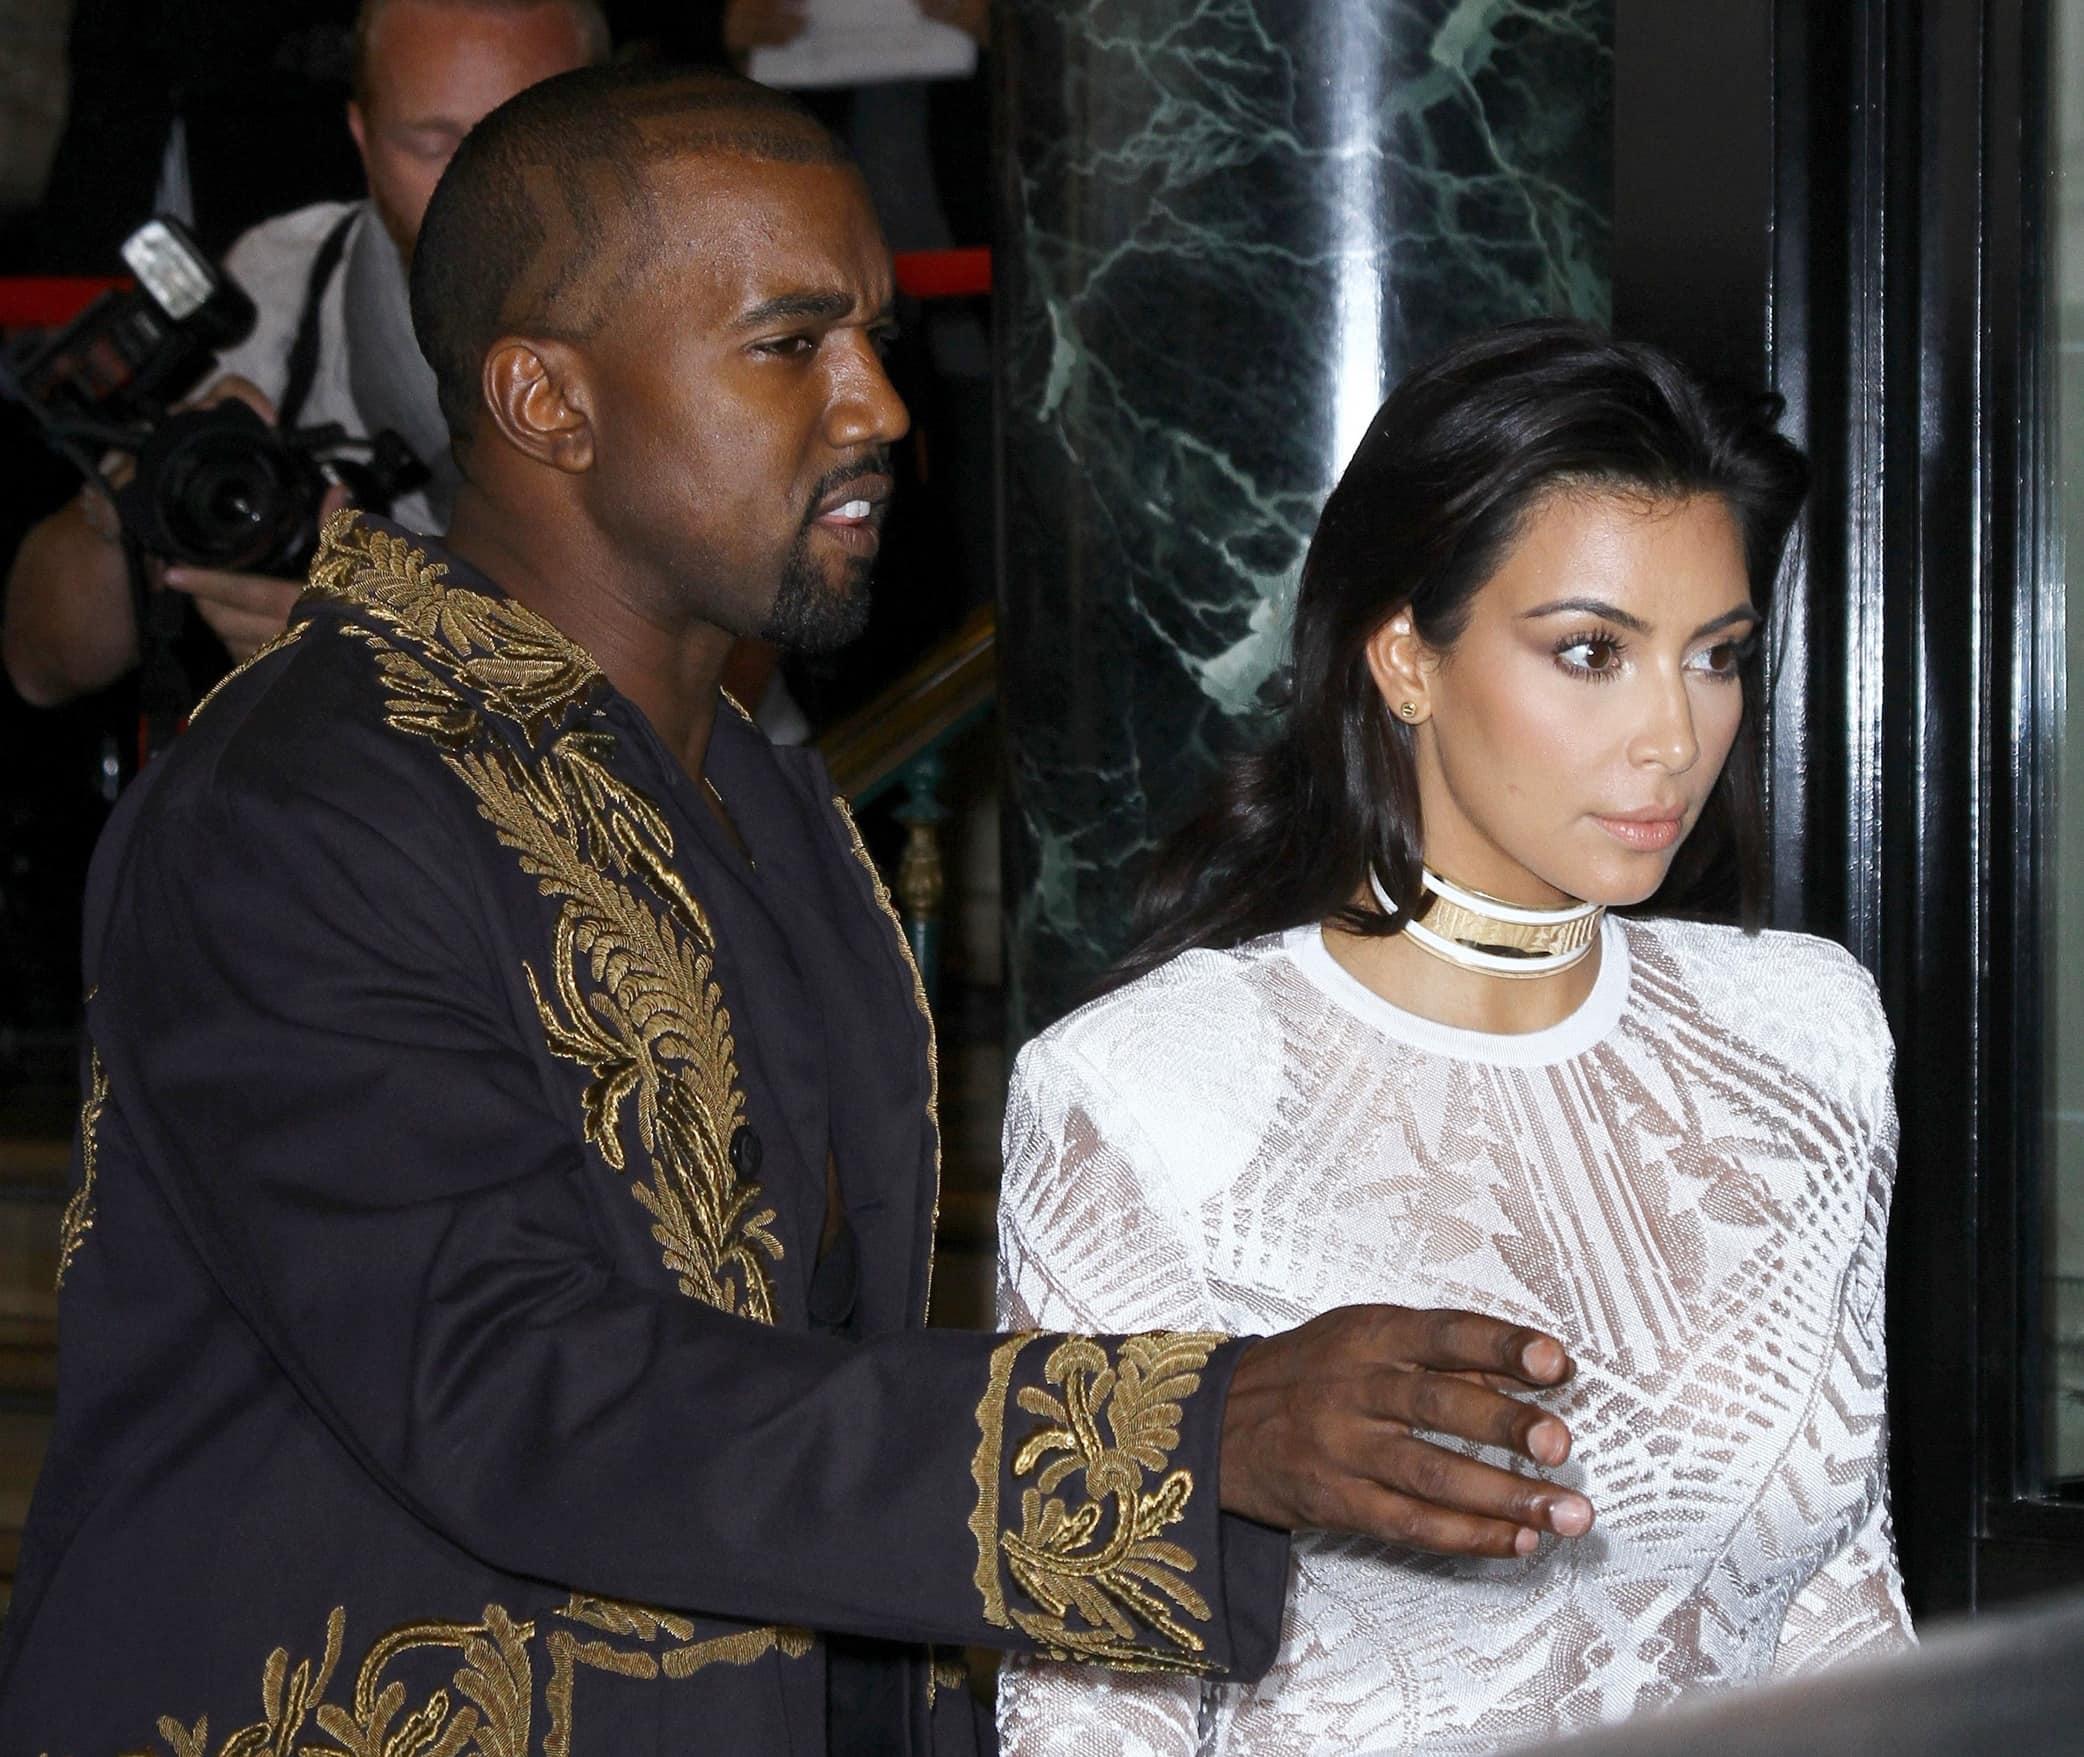 Kim Kardashian styled her white dress with a white-and-gold metallic Balmain choker